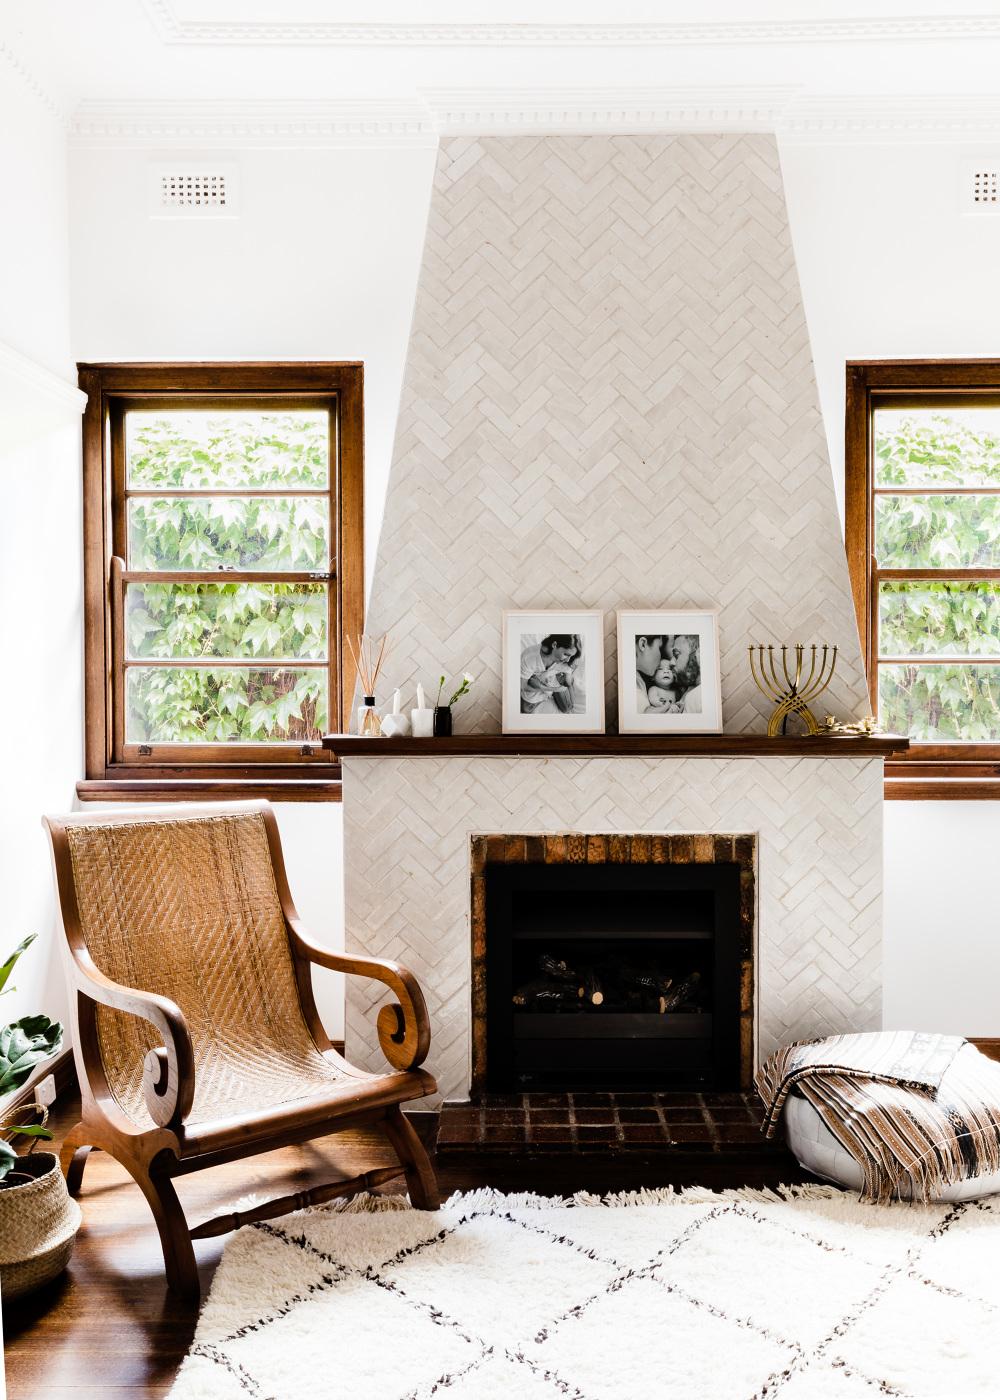 GABBE Interior Design   Amelia Stanwix Photography U2022 Melbourne Based  Lifestyle, Interior And Portrait Photographer.